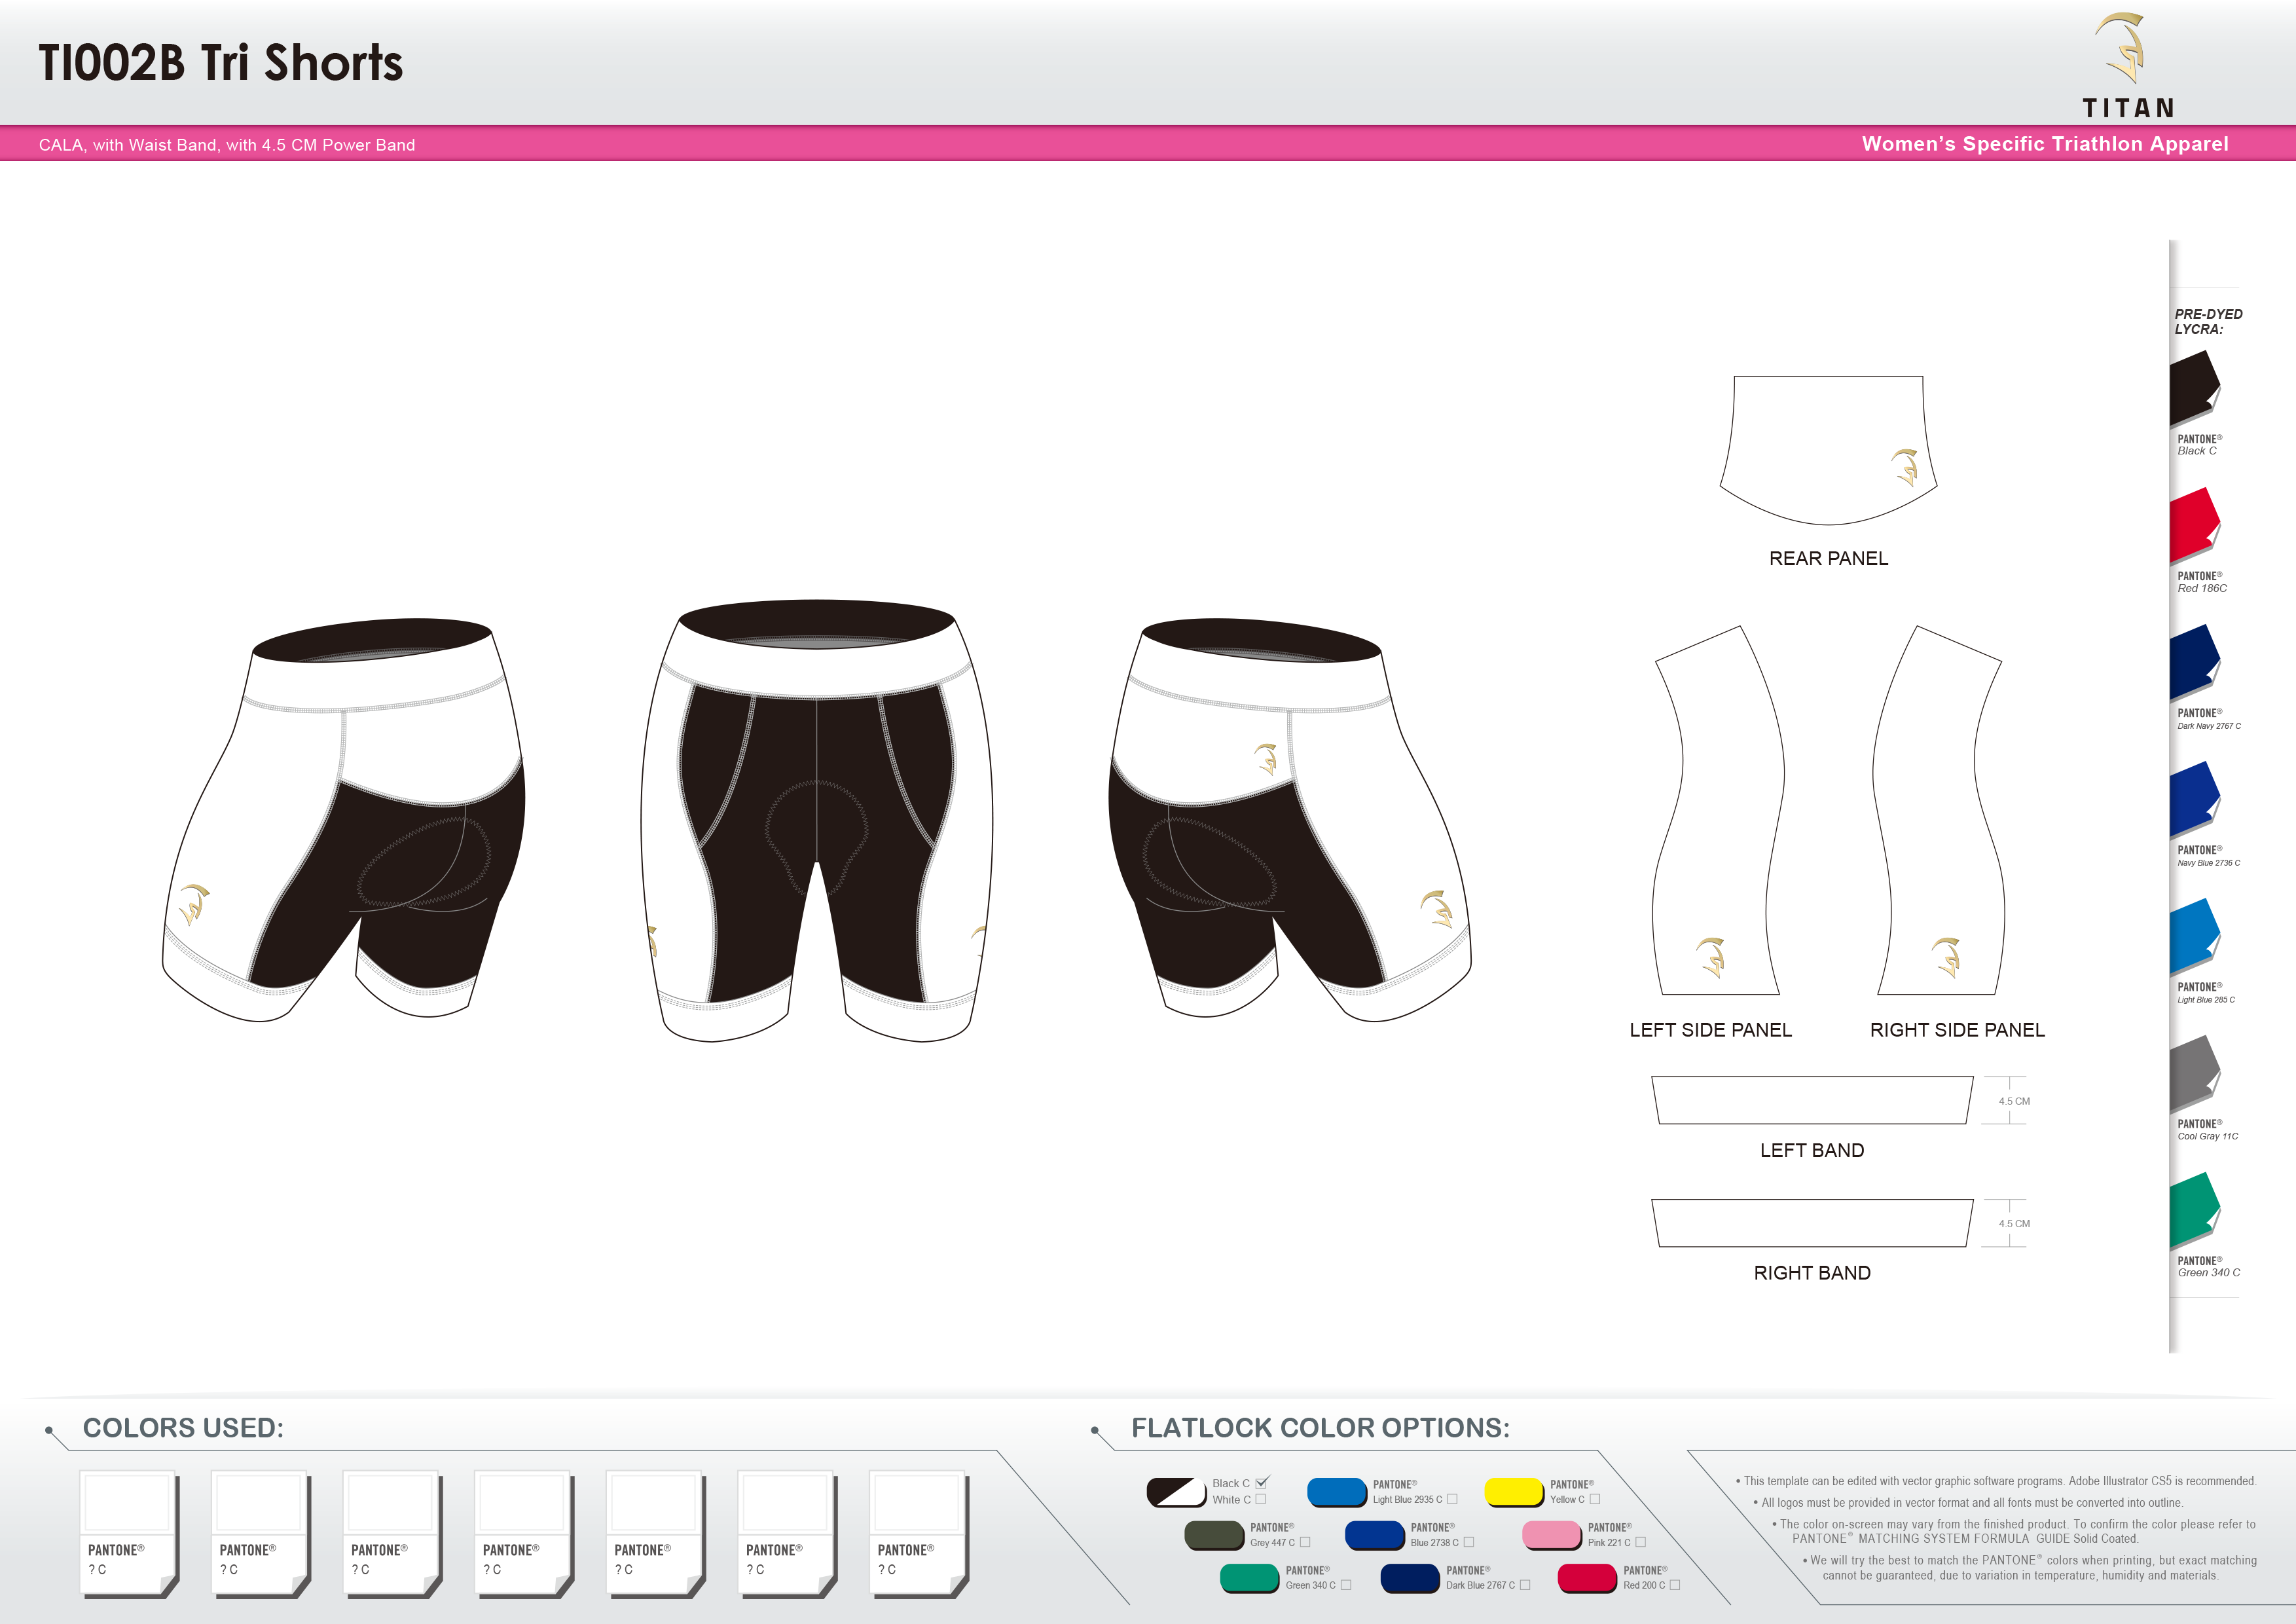 TI002B Women's Tri Shorts